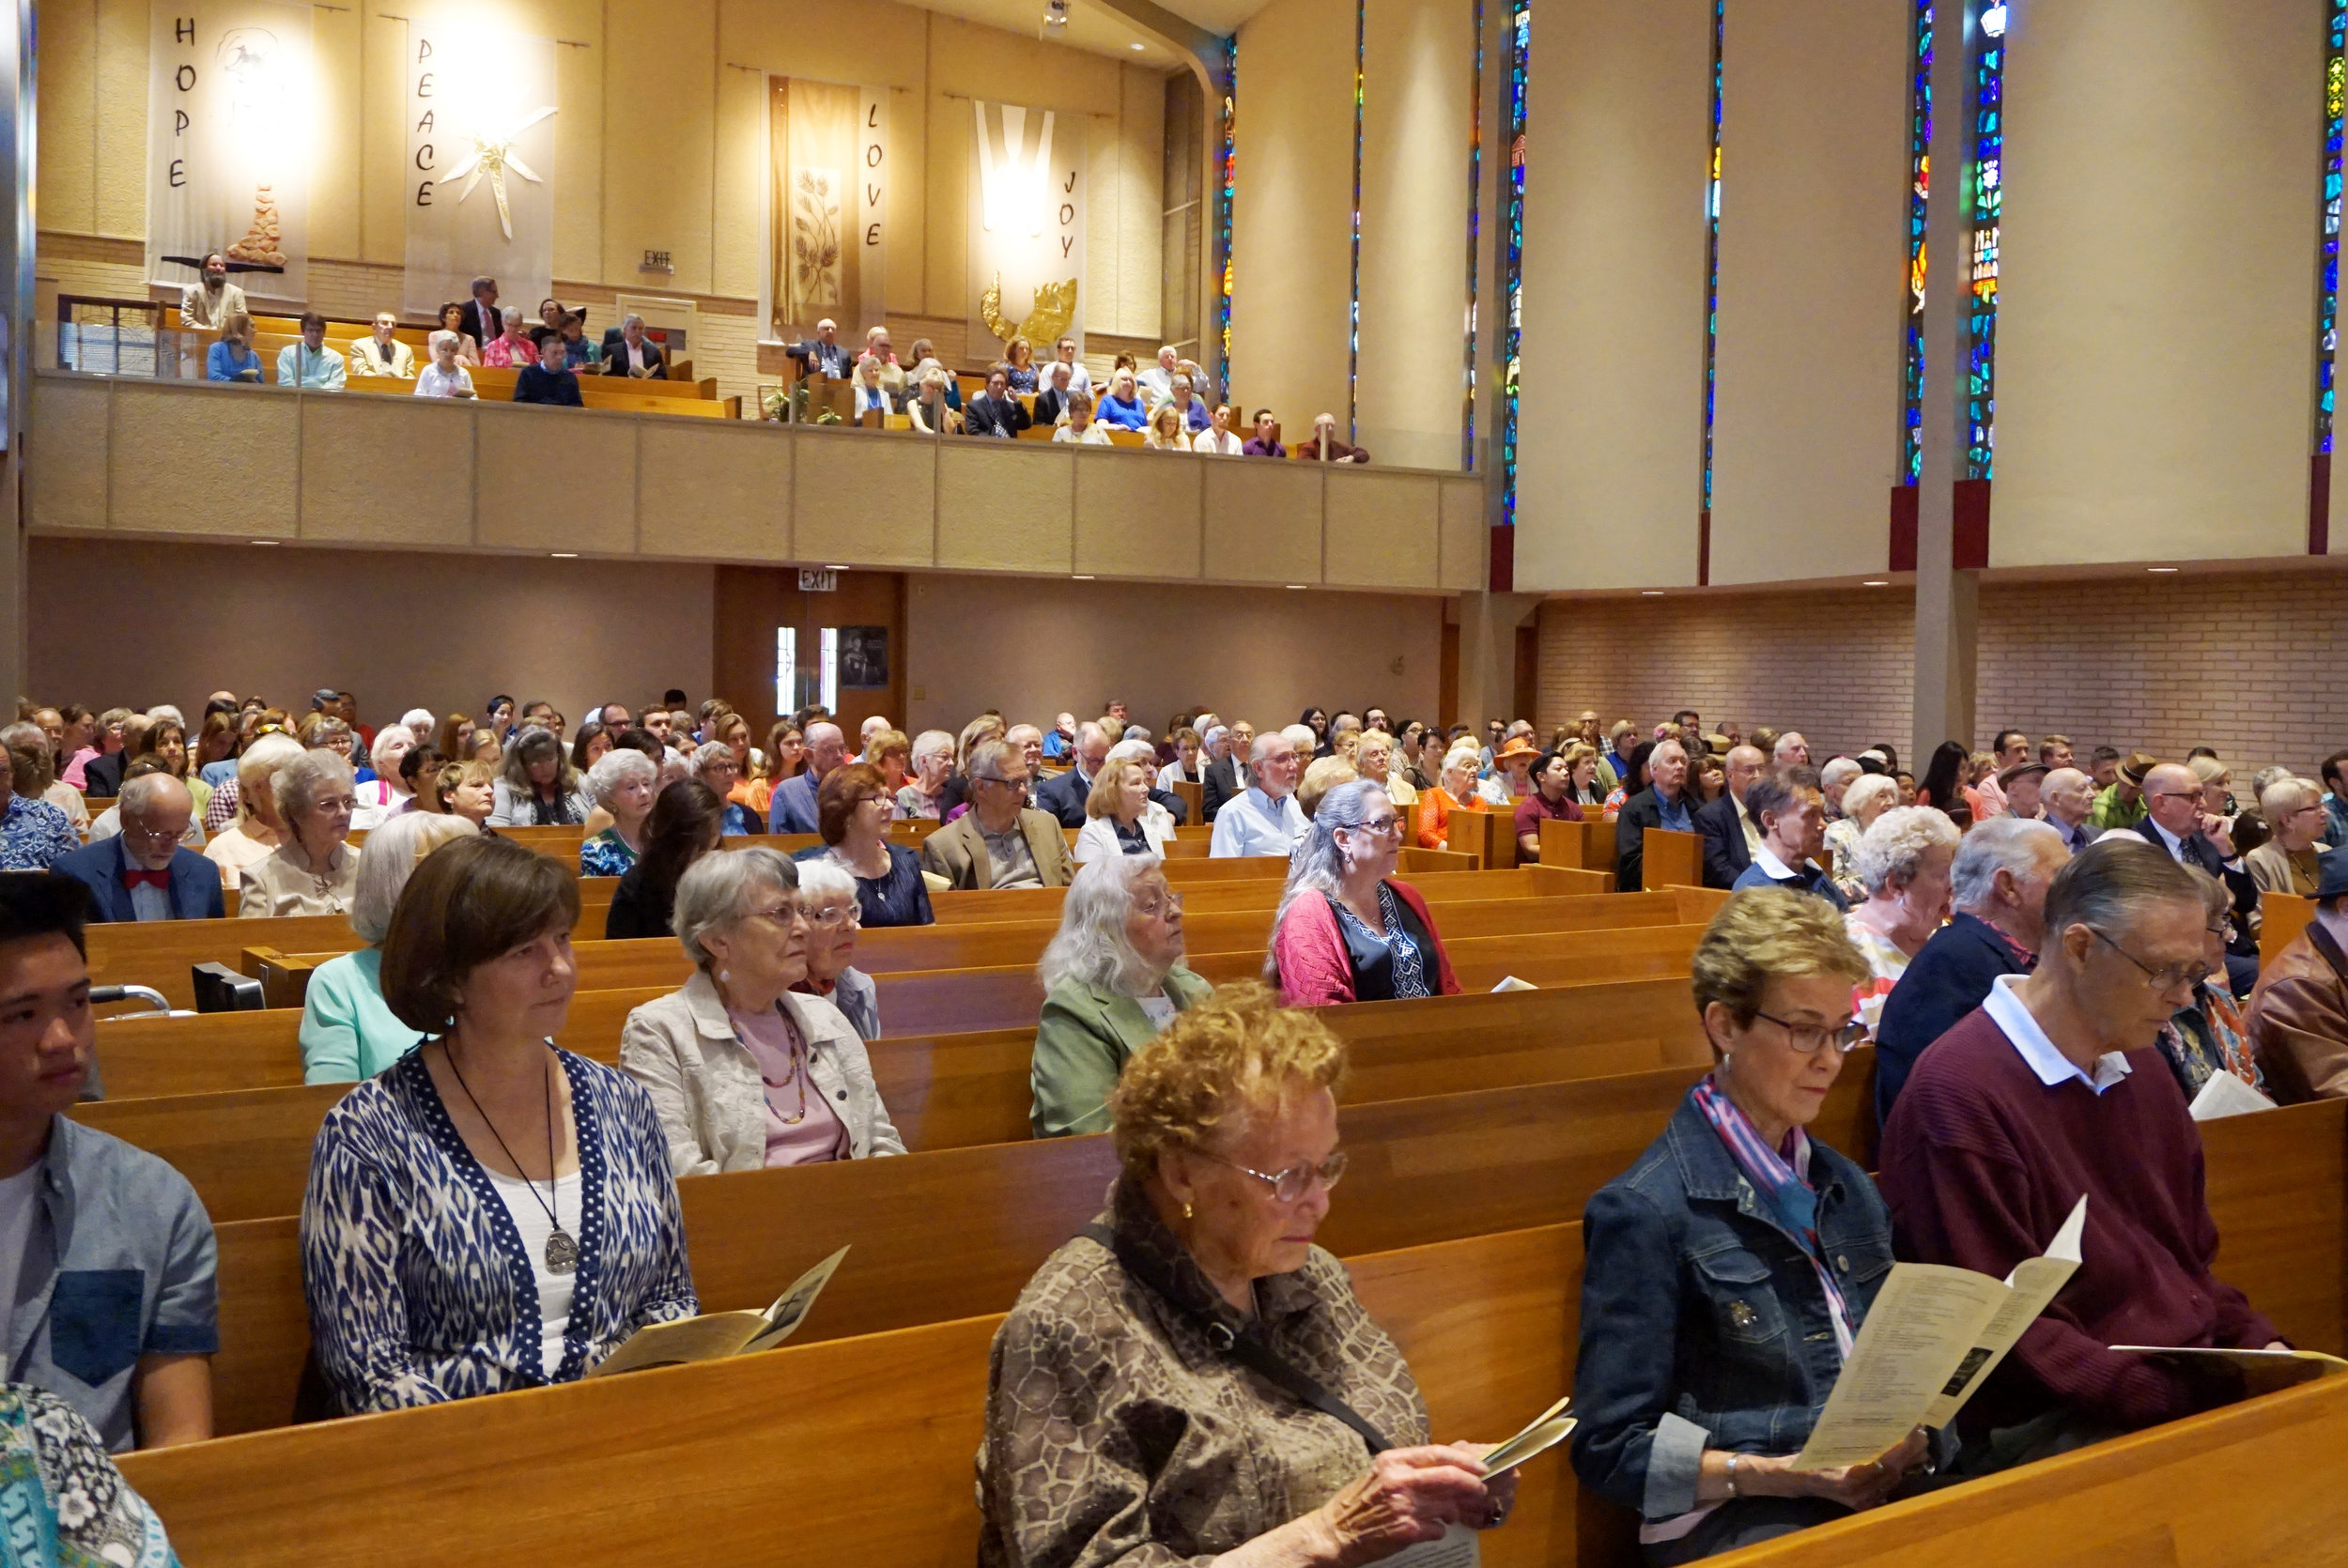 Claremont-Presbyterian-Church-Congregation-16.jpg